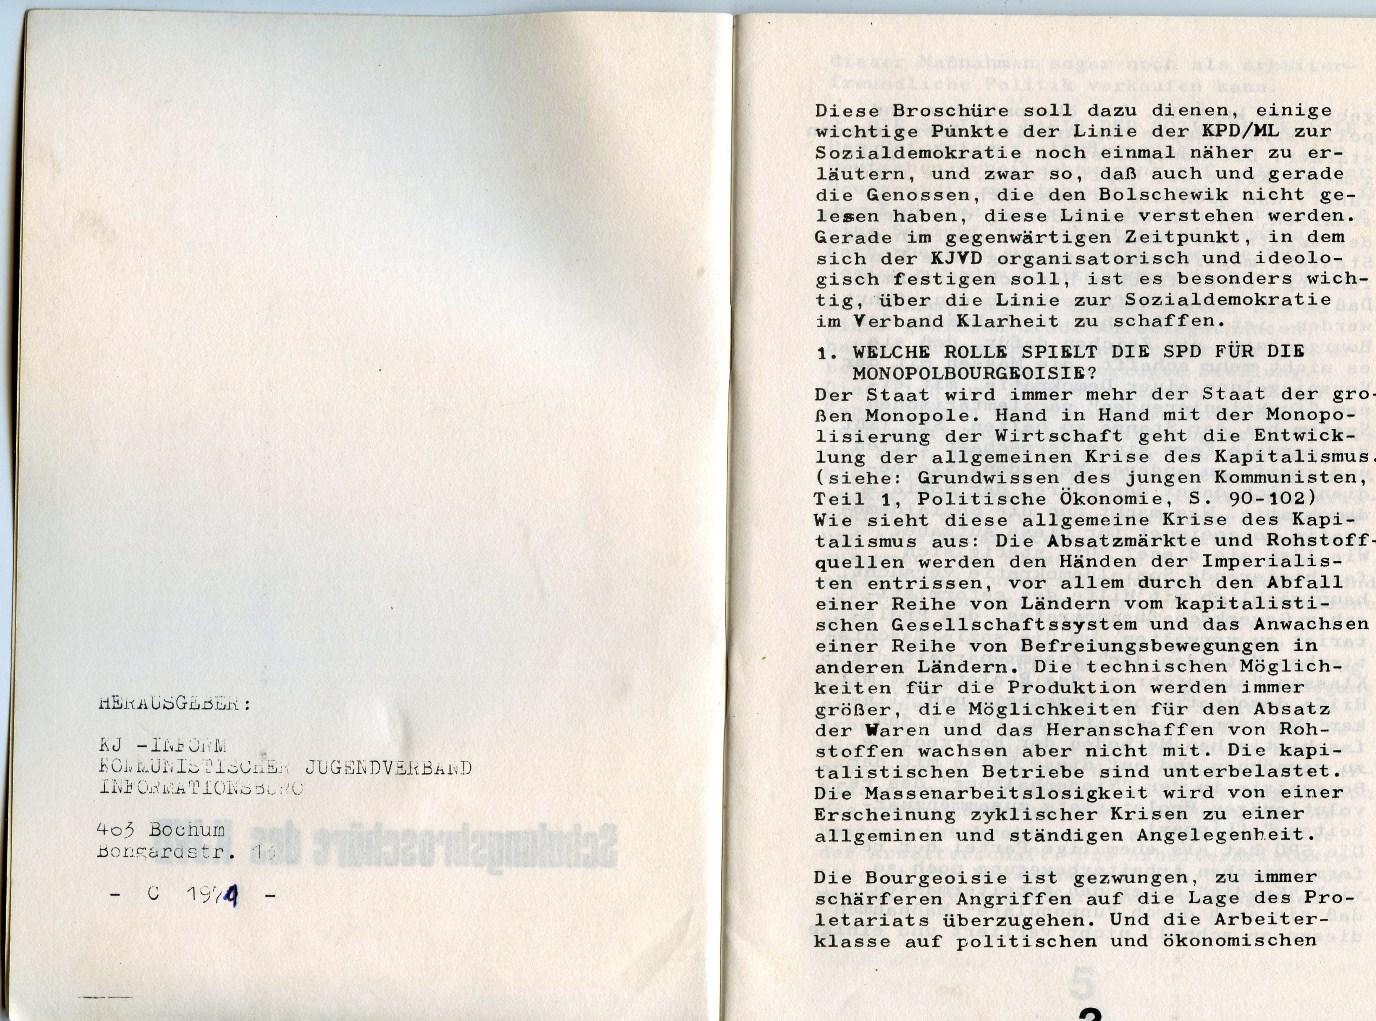 KJVD_Sozialdemokratie_Sozialfaschismus_1971_03